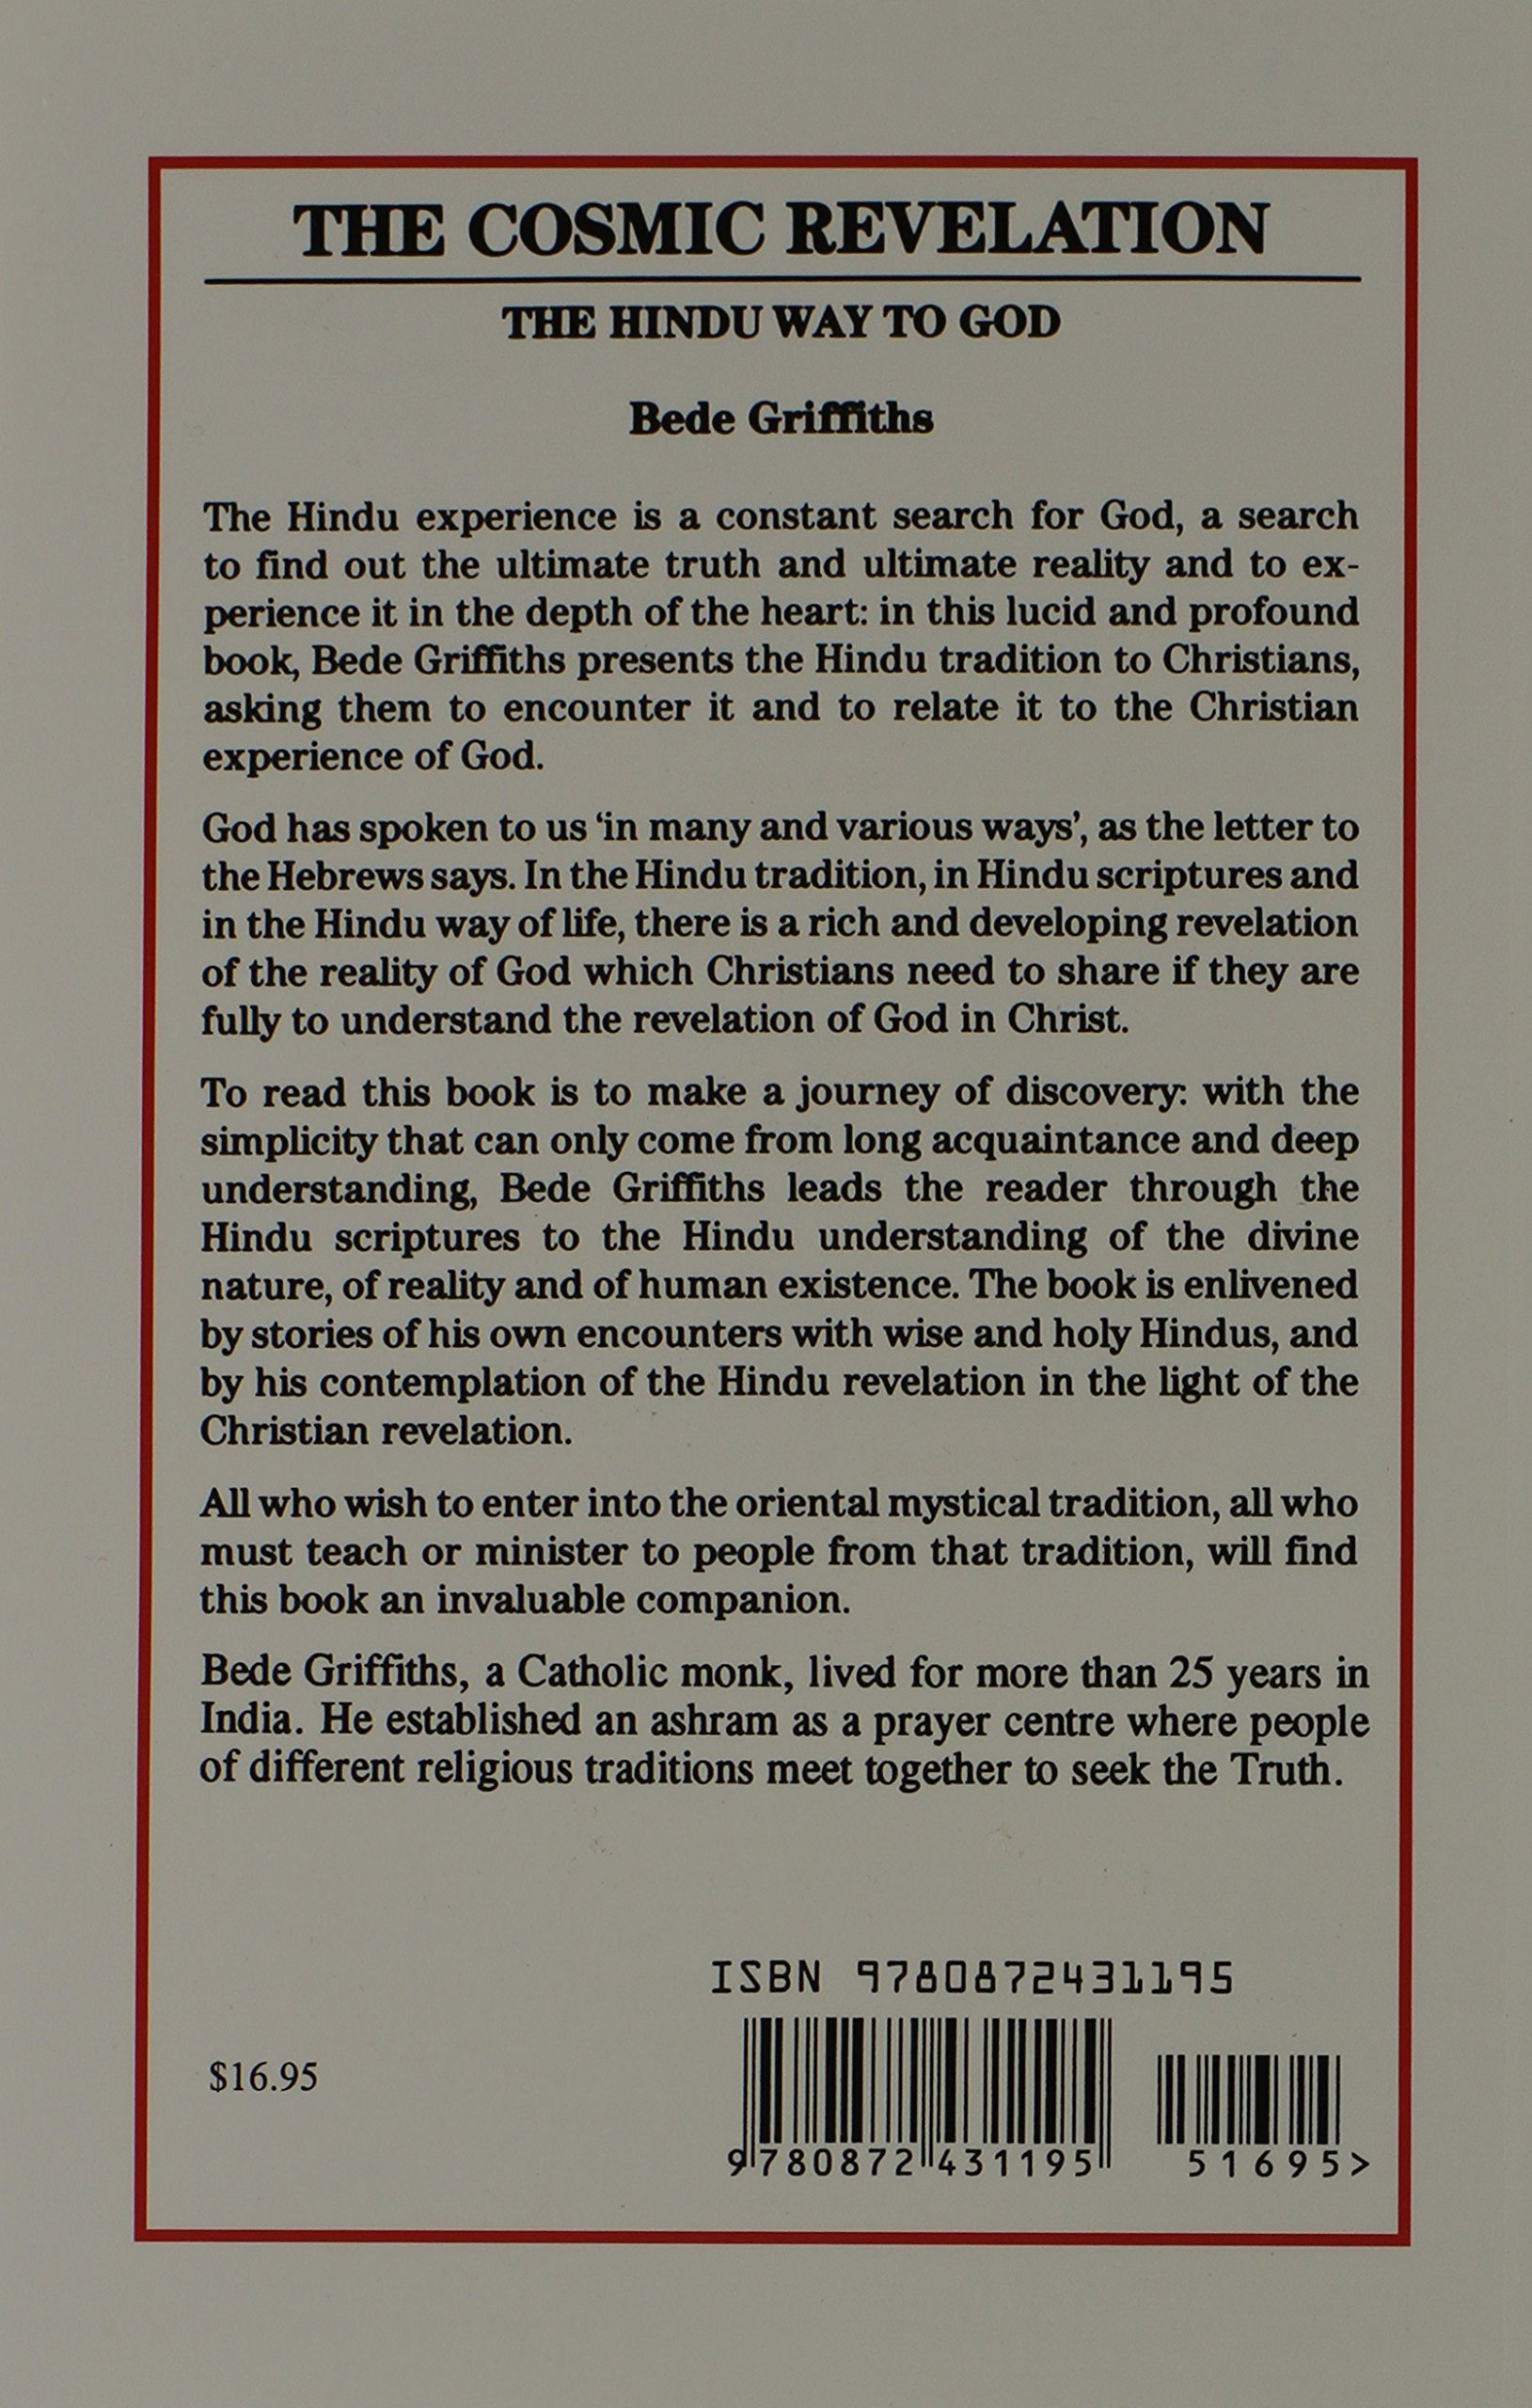 The cosmic revelation the hindu way to god bede griffiths the cosmic revelation the hindu way to god bede griffiths 9780872431195 amazon books fandeluxe Gallery